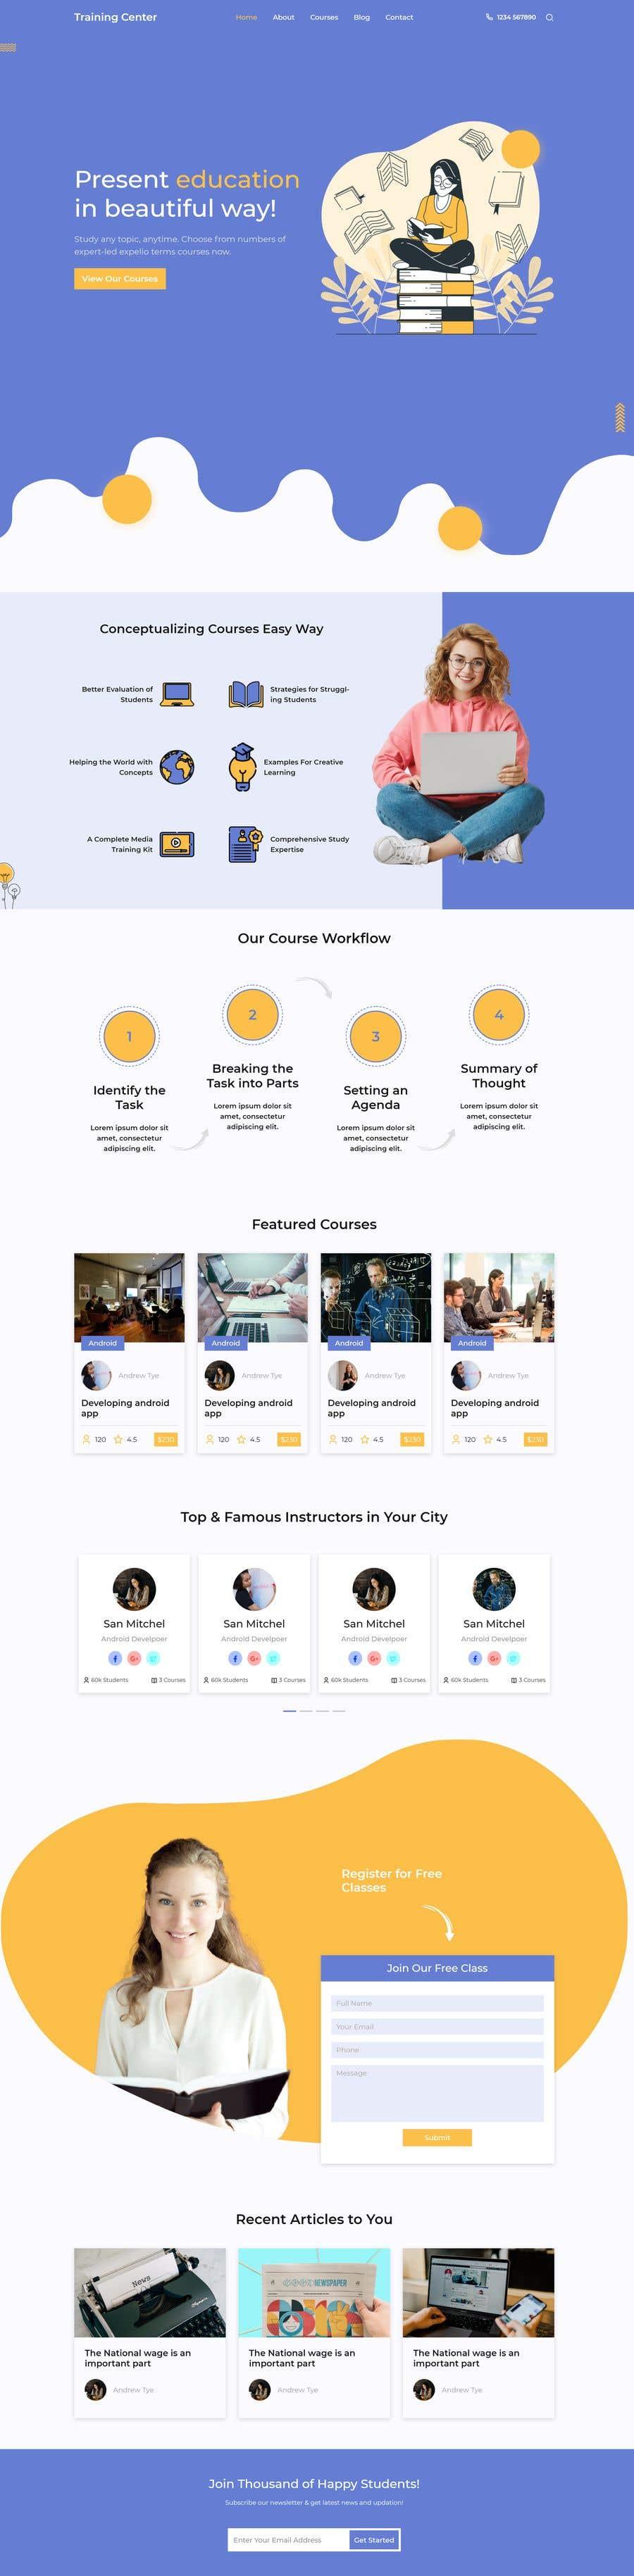 Konkurrenceindlæg #                                        40                                      for                                         Looking for best Website Landing Page Designer for My Product Landing Page